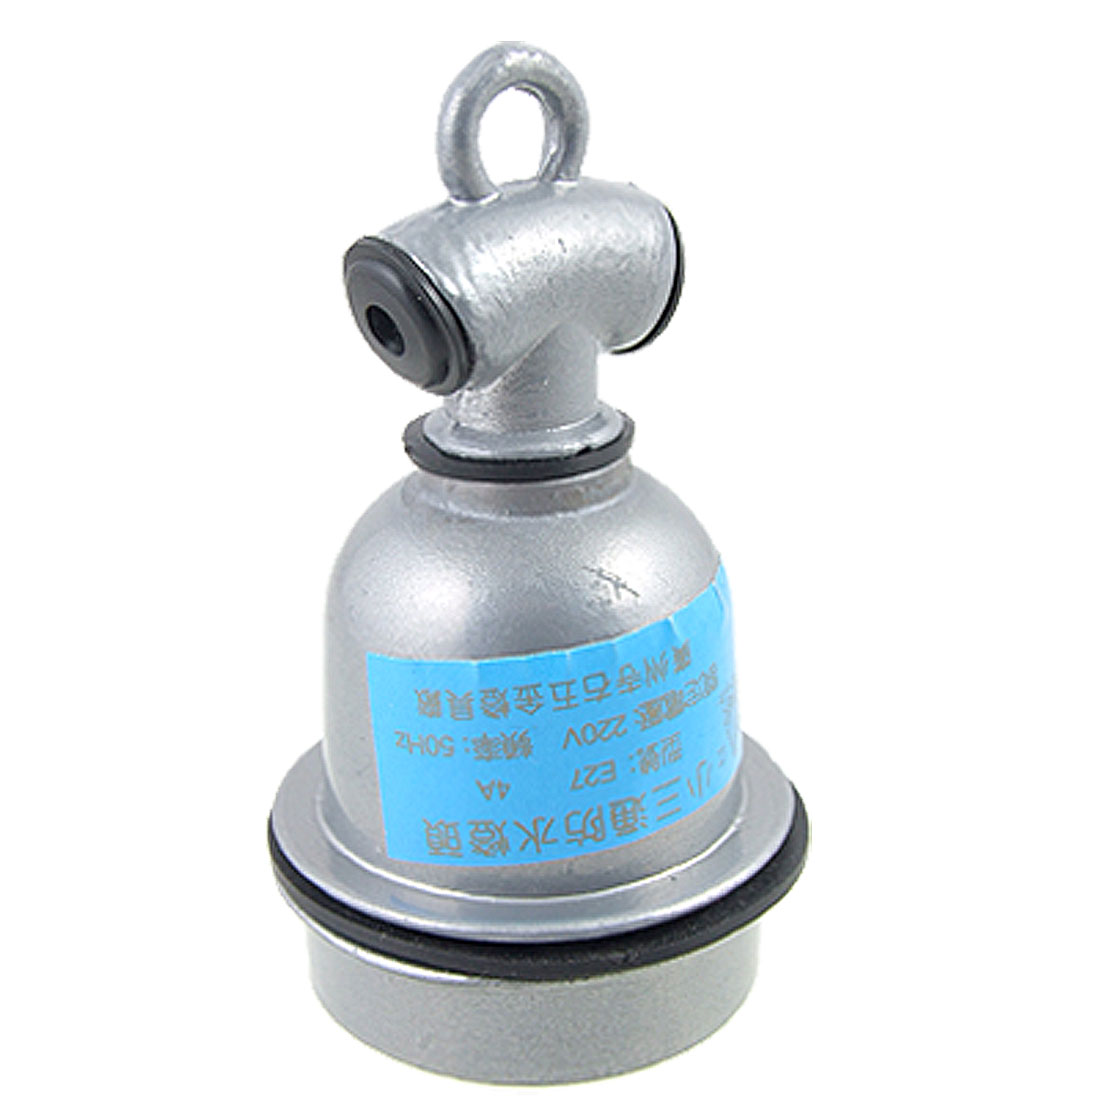 Water Resistant Aluminum E27 Die-casting Lampholder 220V AC